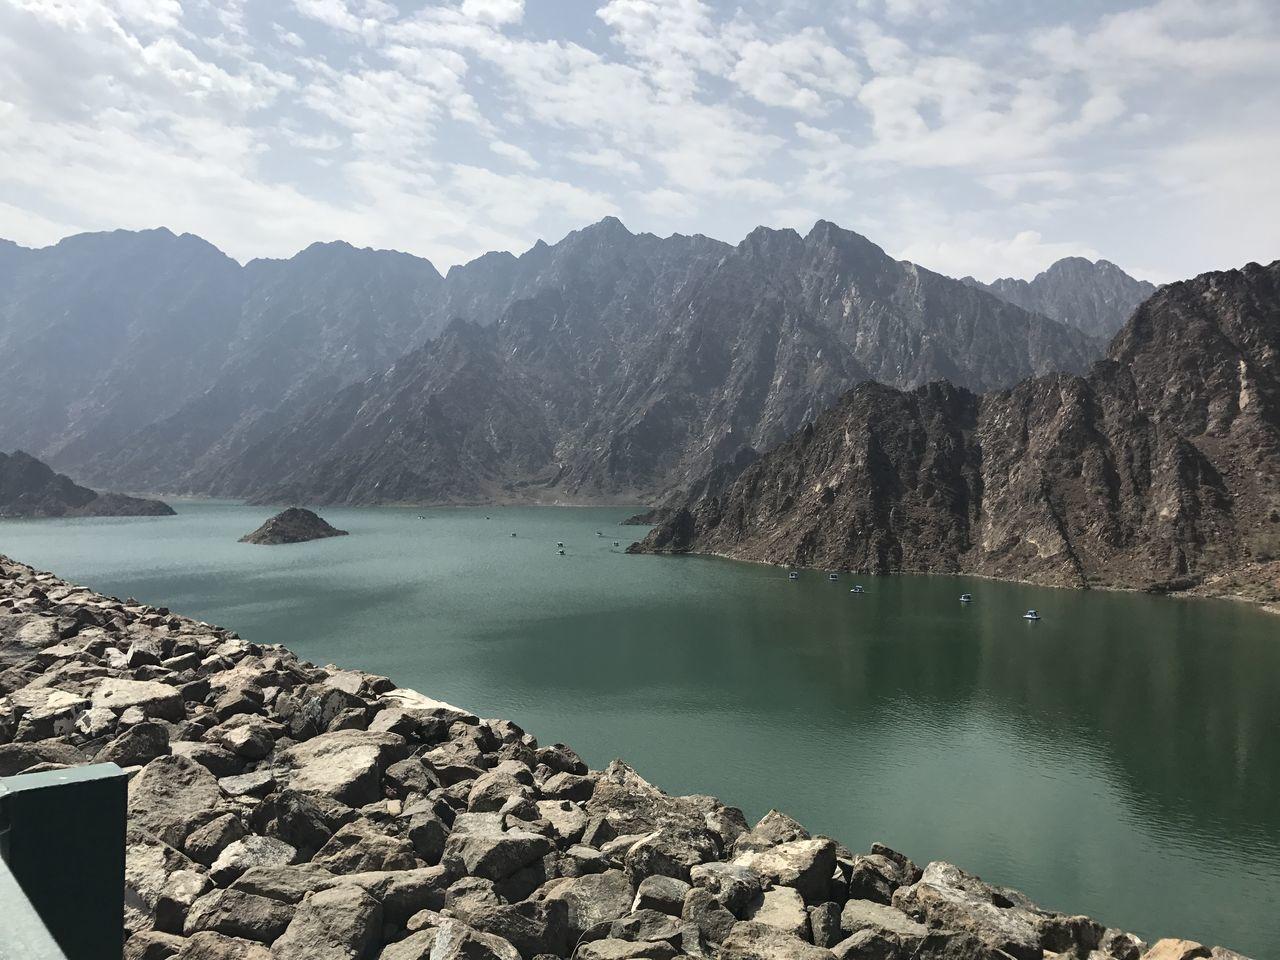 Hatta dam, dubai Lake Landscape Water Wilderness Mountain Nautical Vessel Outdoors Scenics No People Day HattaDam Hatta Hatta Dubai